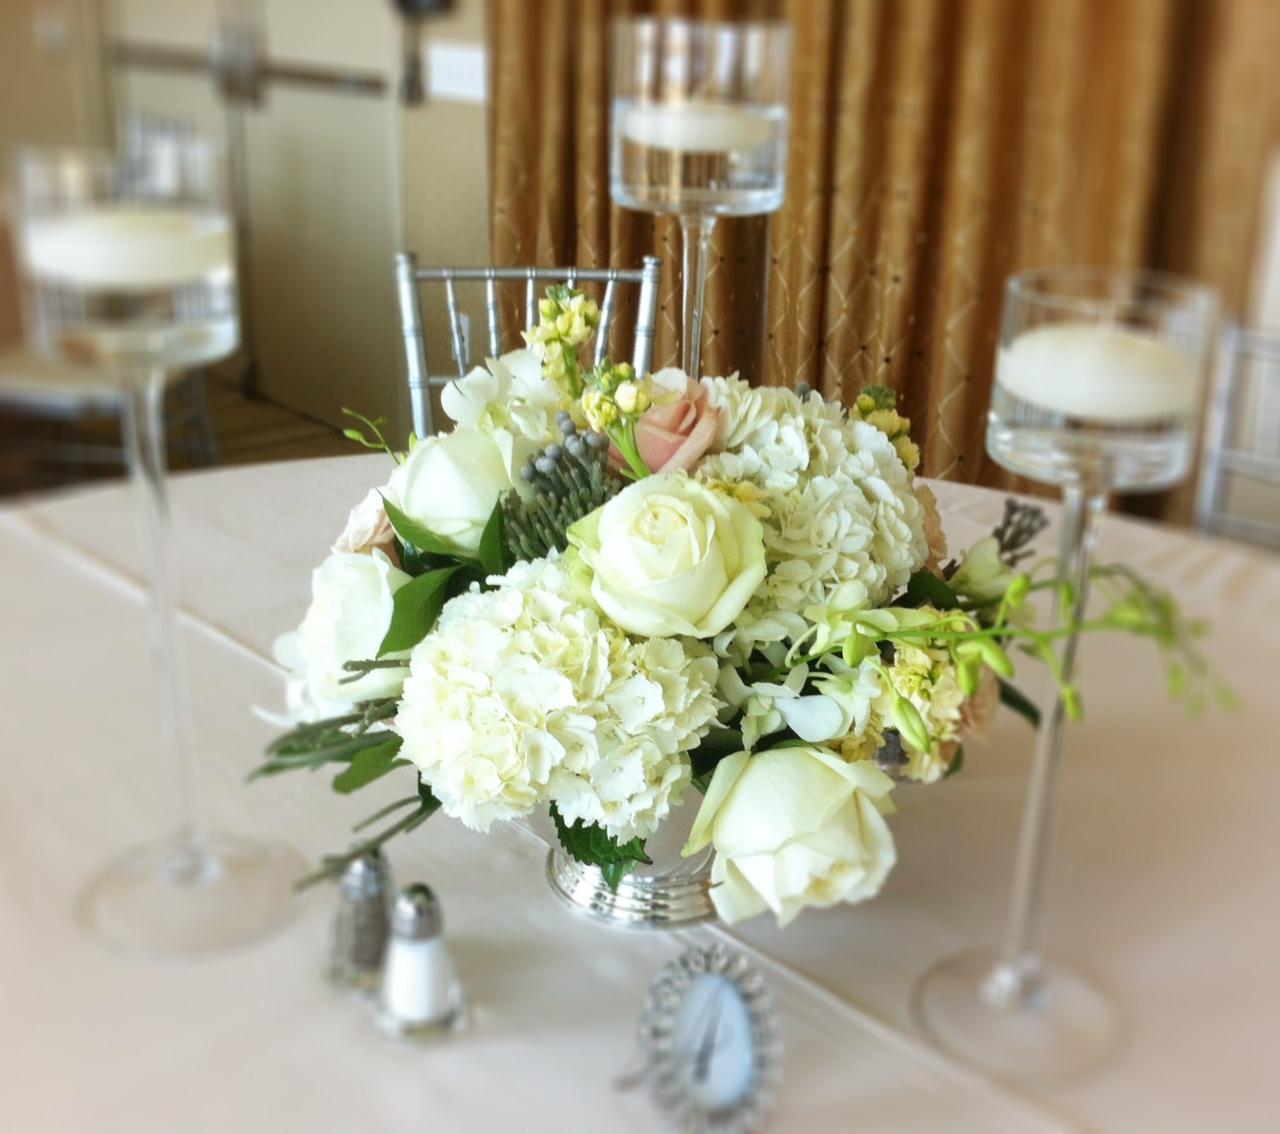 25th Wedding Anniversary Party  Vow Renewal Ceremony  Elizabeth Wray Design